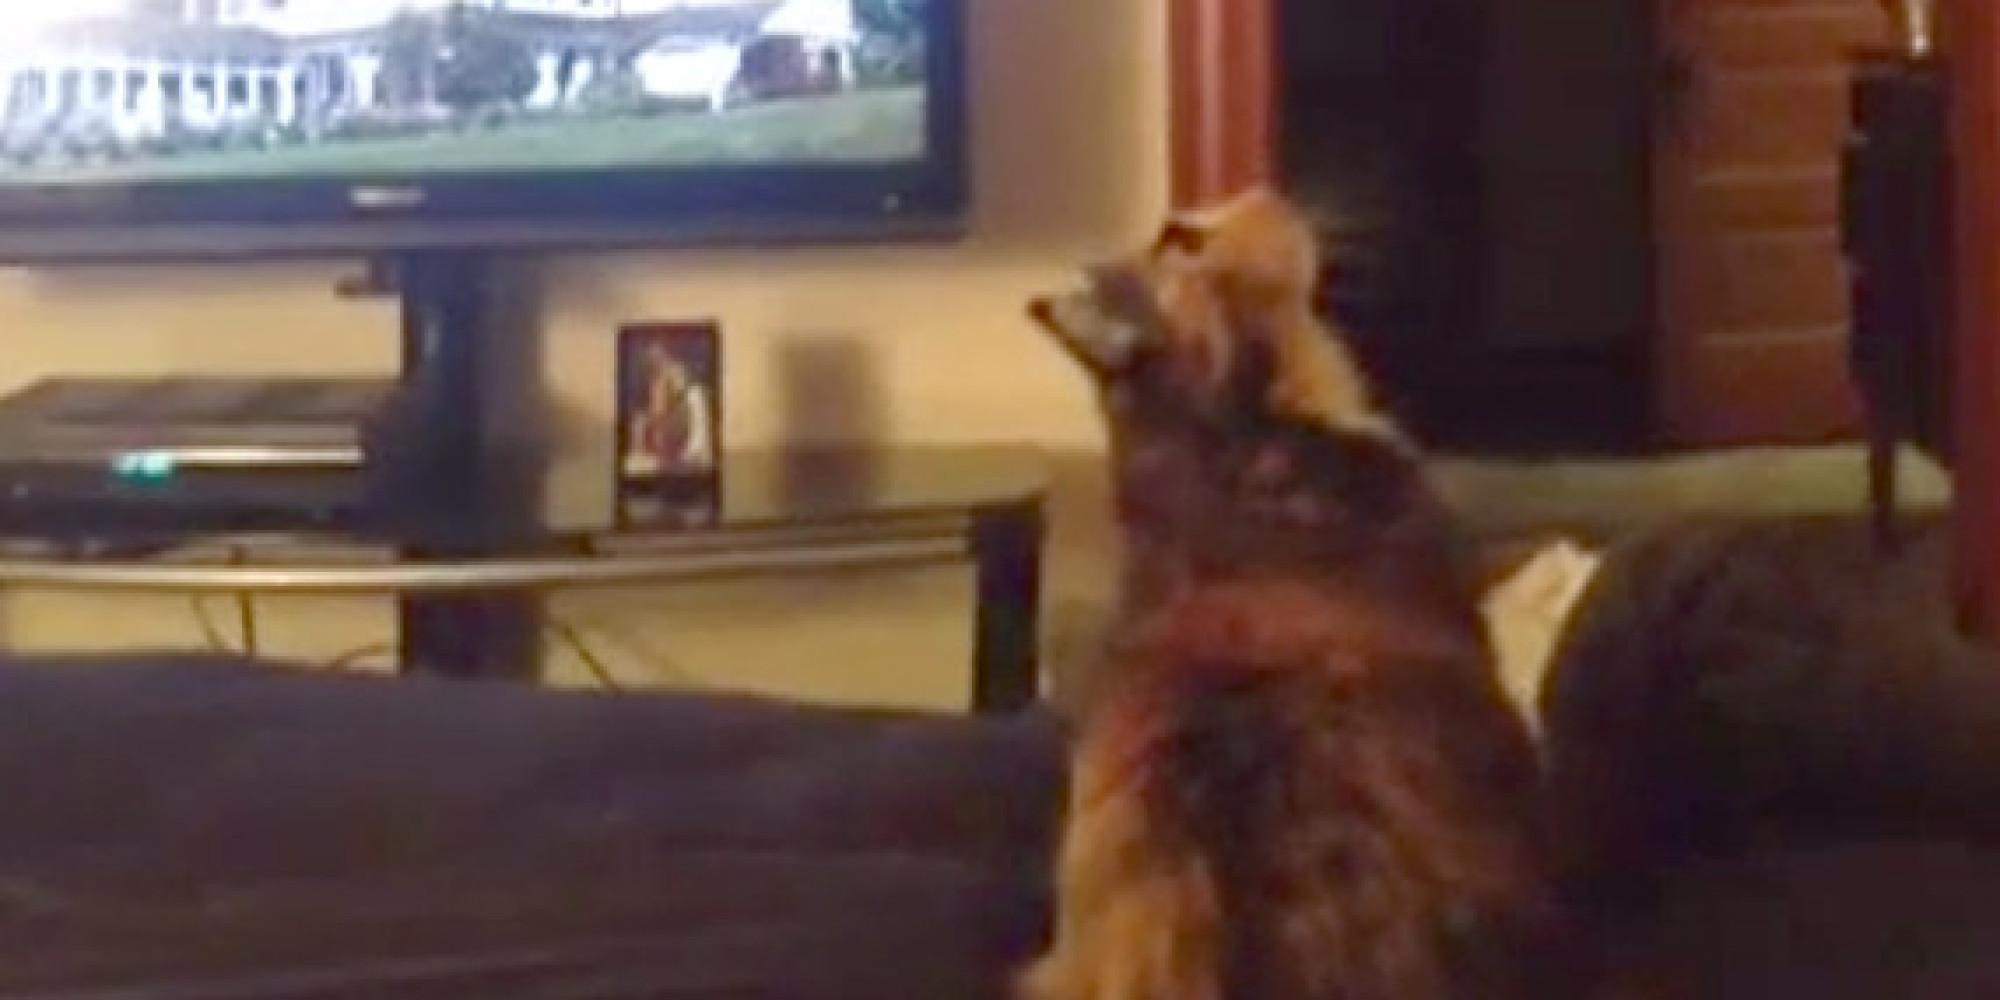 cat jumping backwards fail succinctly sums up monday